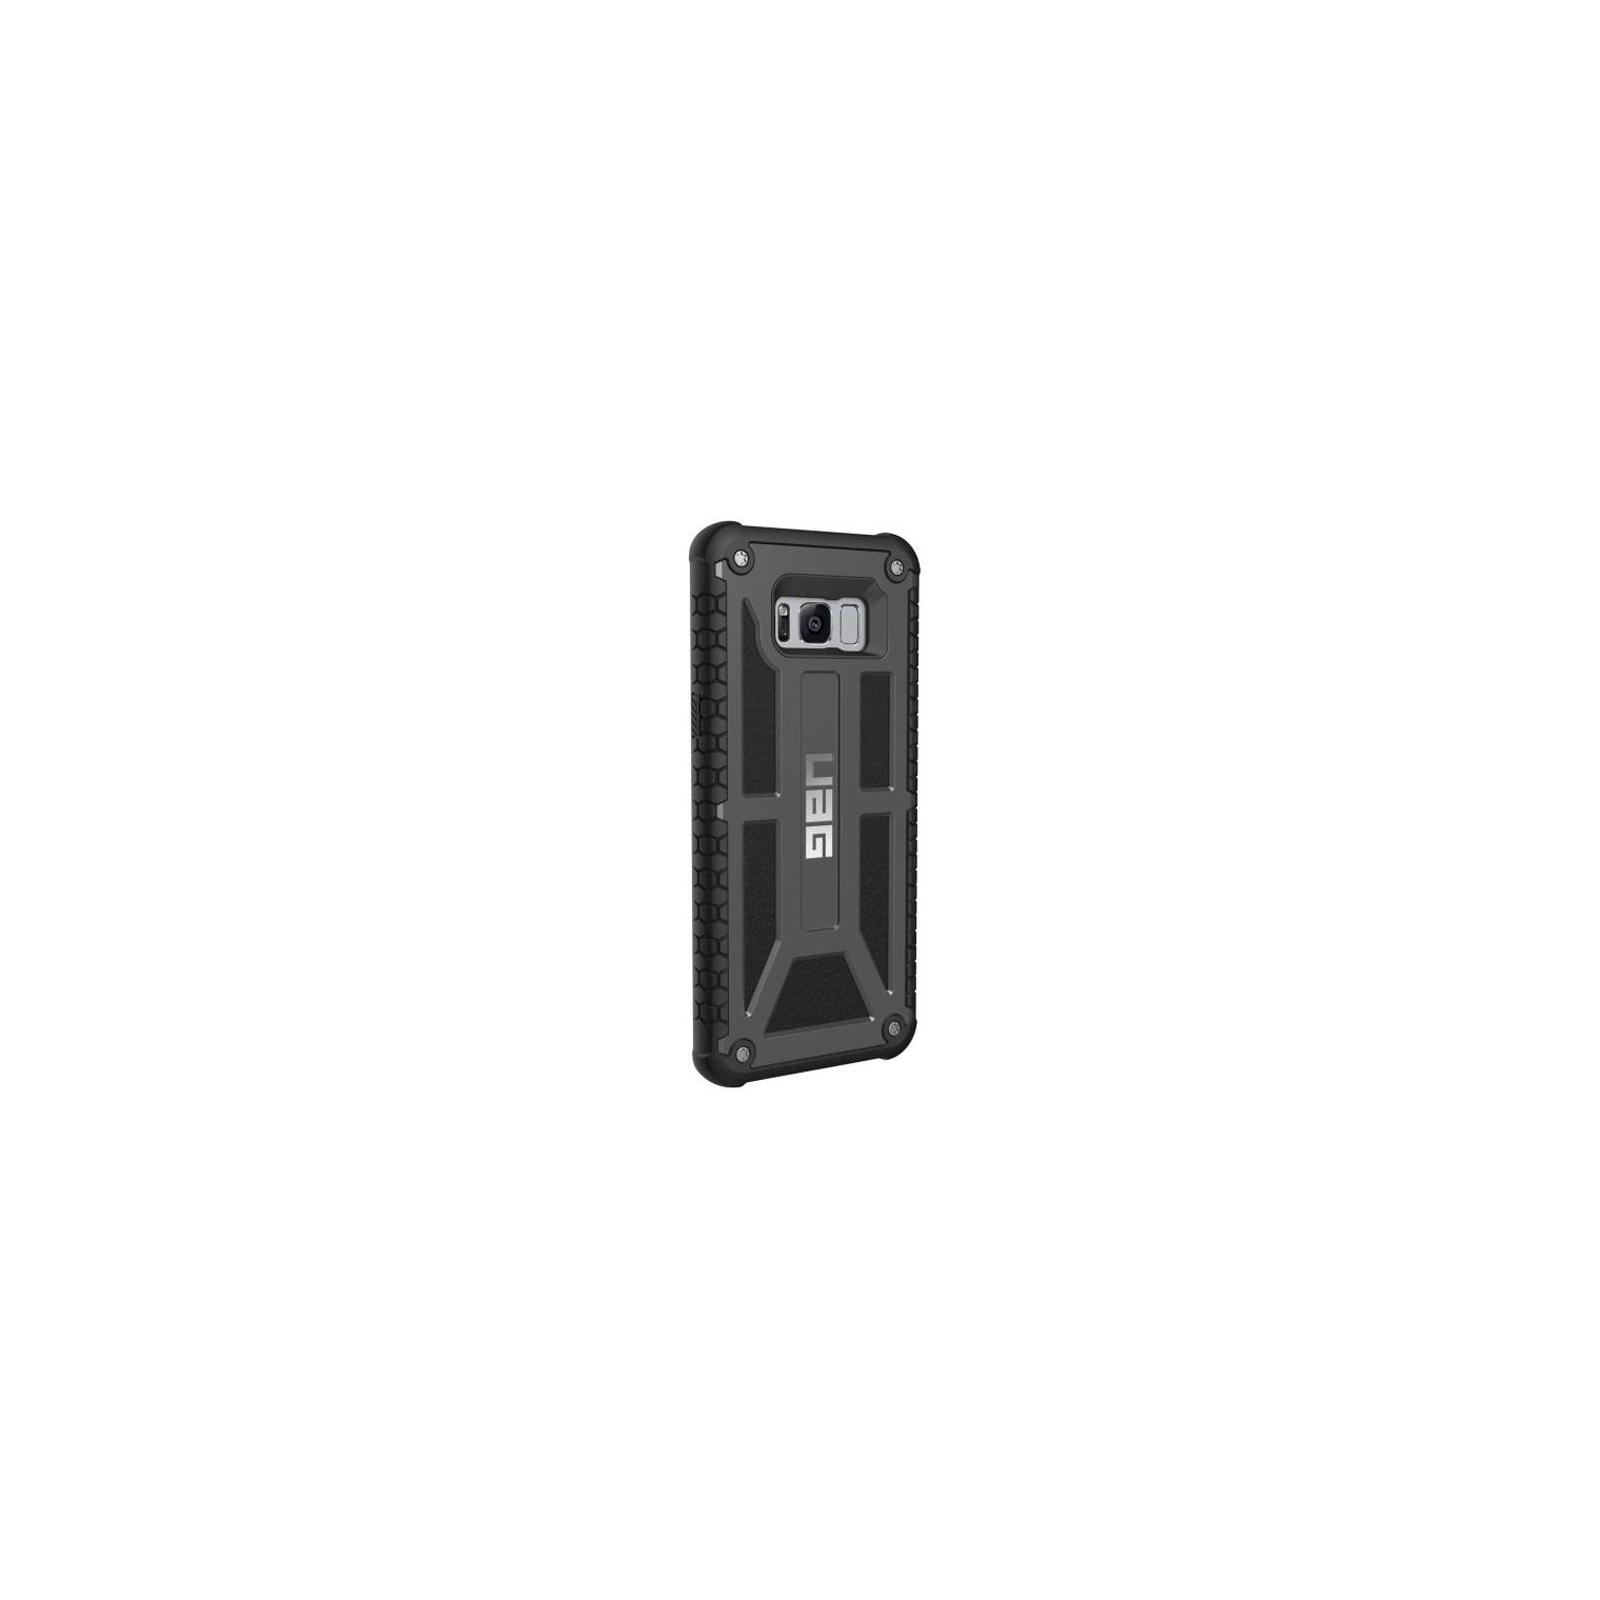 Чехол для моб. телефона Uag Galaxy S8 + Monarch Graphite (GLXS8PLS-M-GR) изображение 3